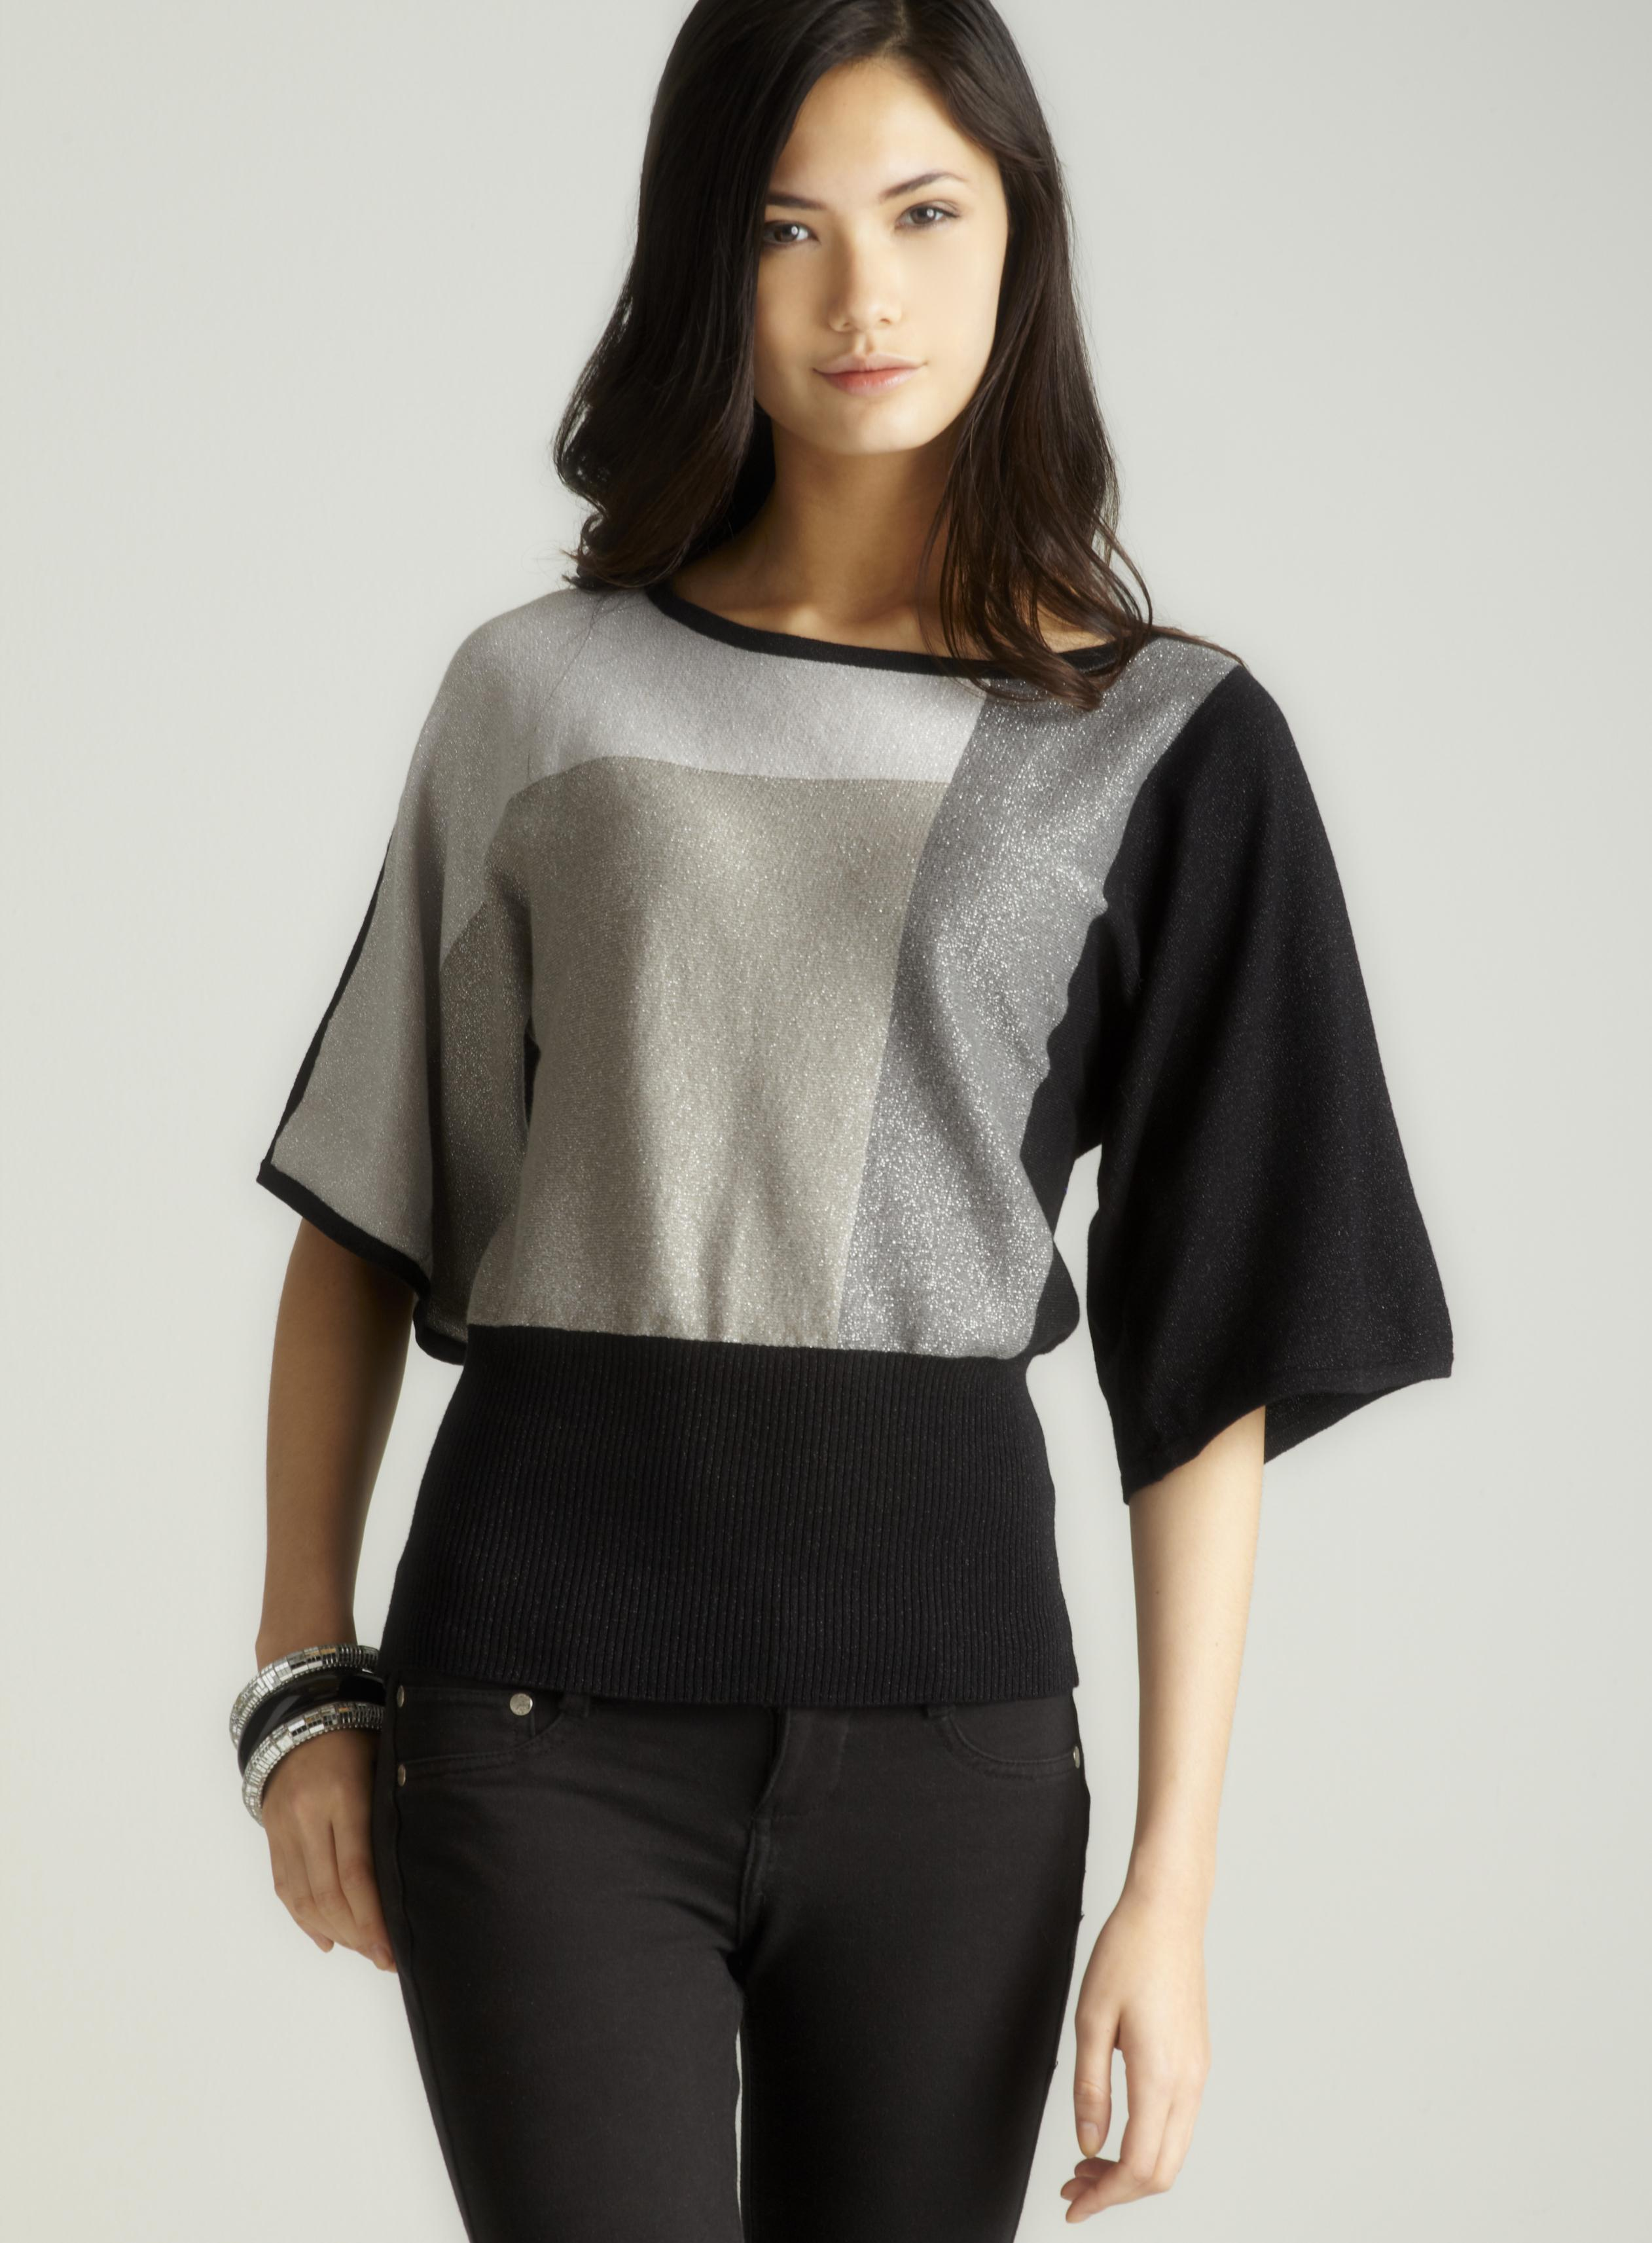 Cable & Gauge Lurex colorblocked sweater